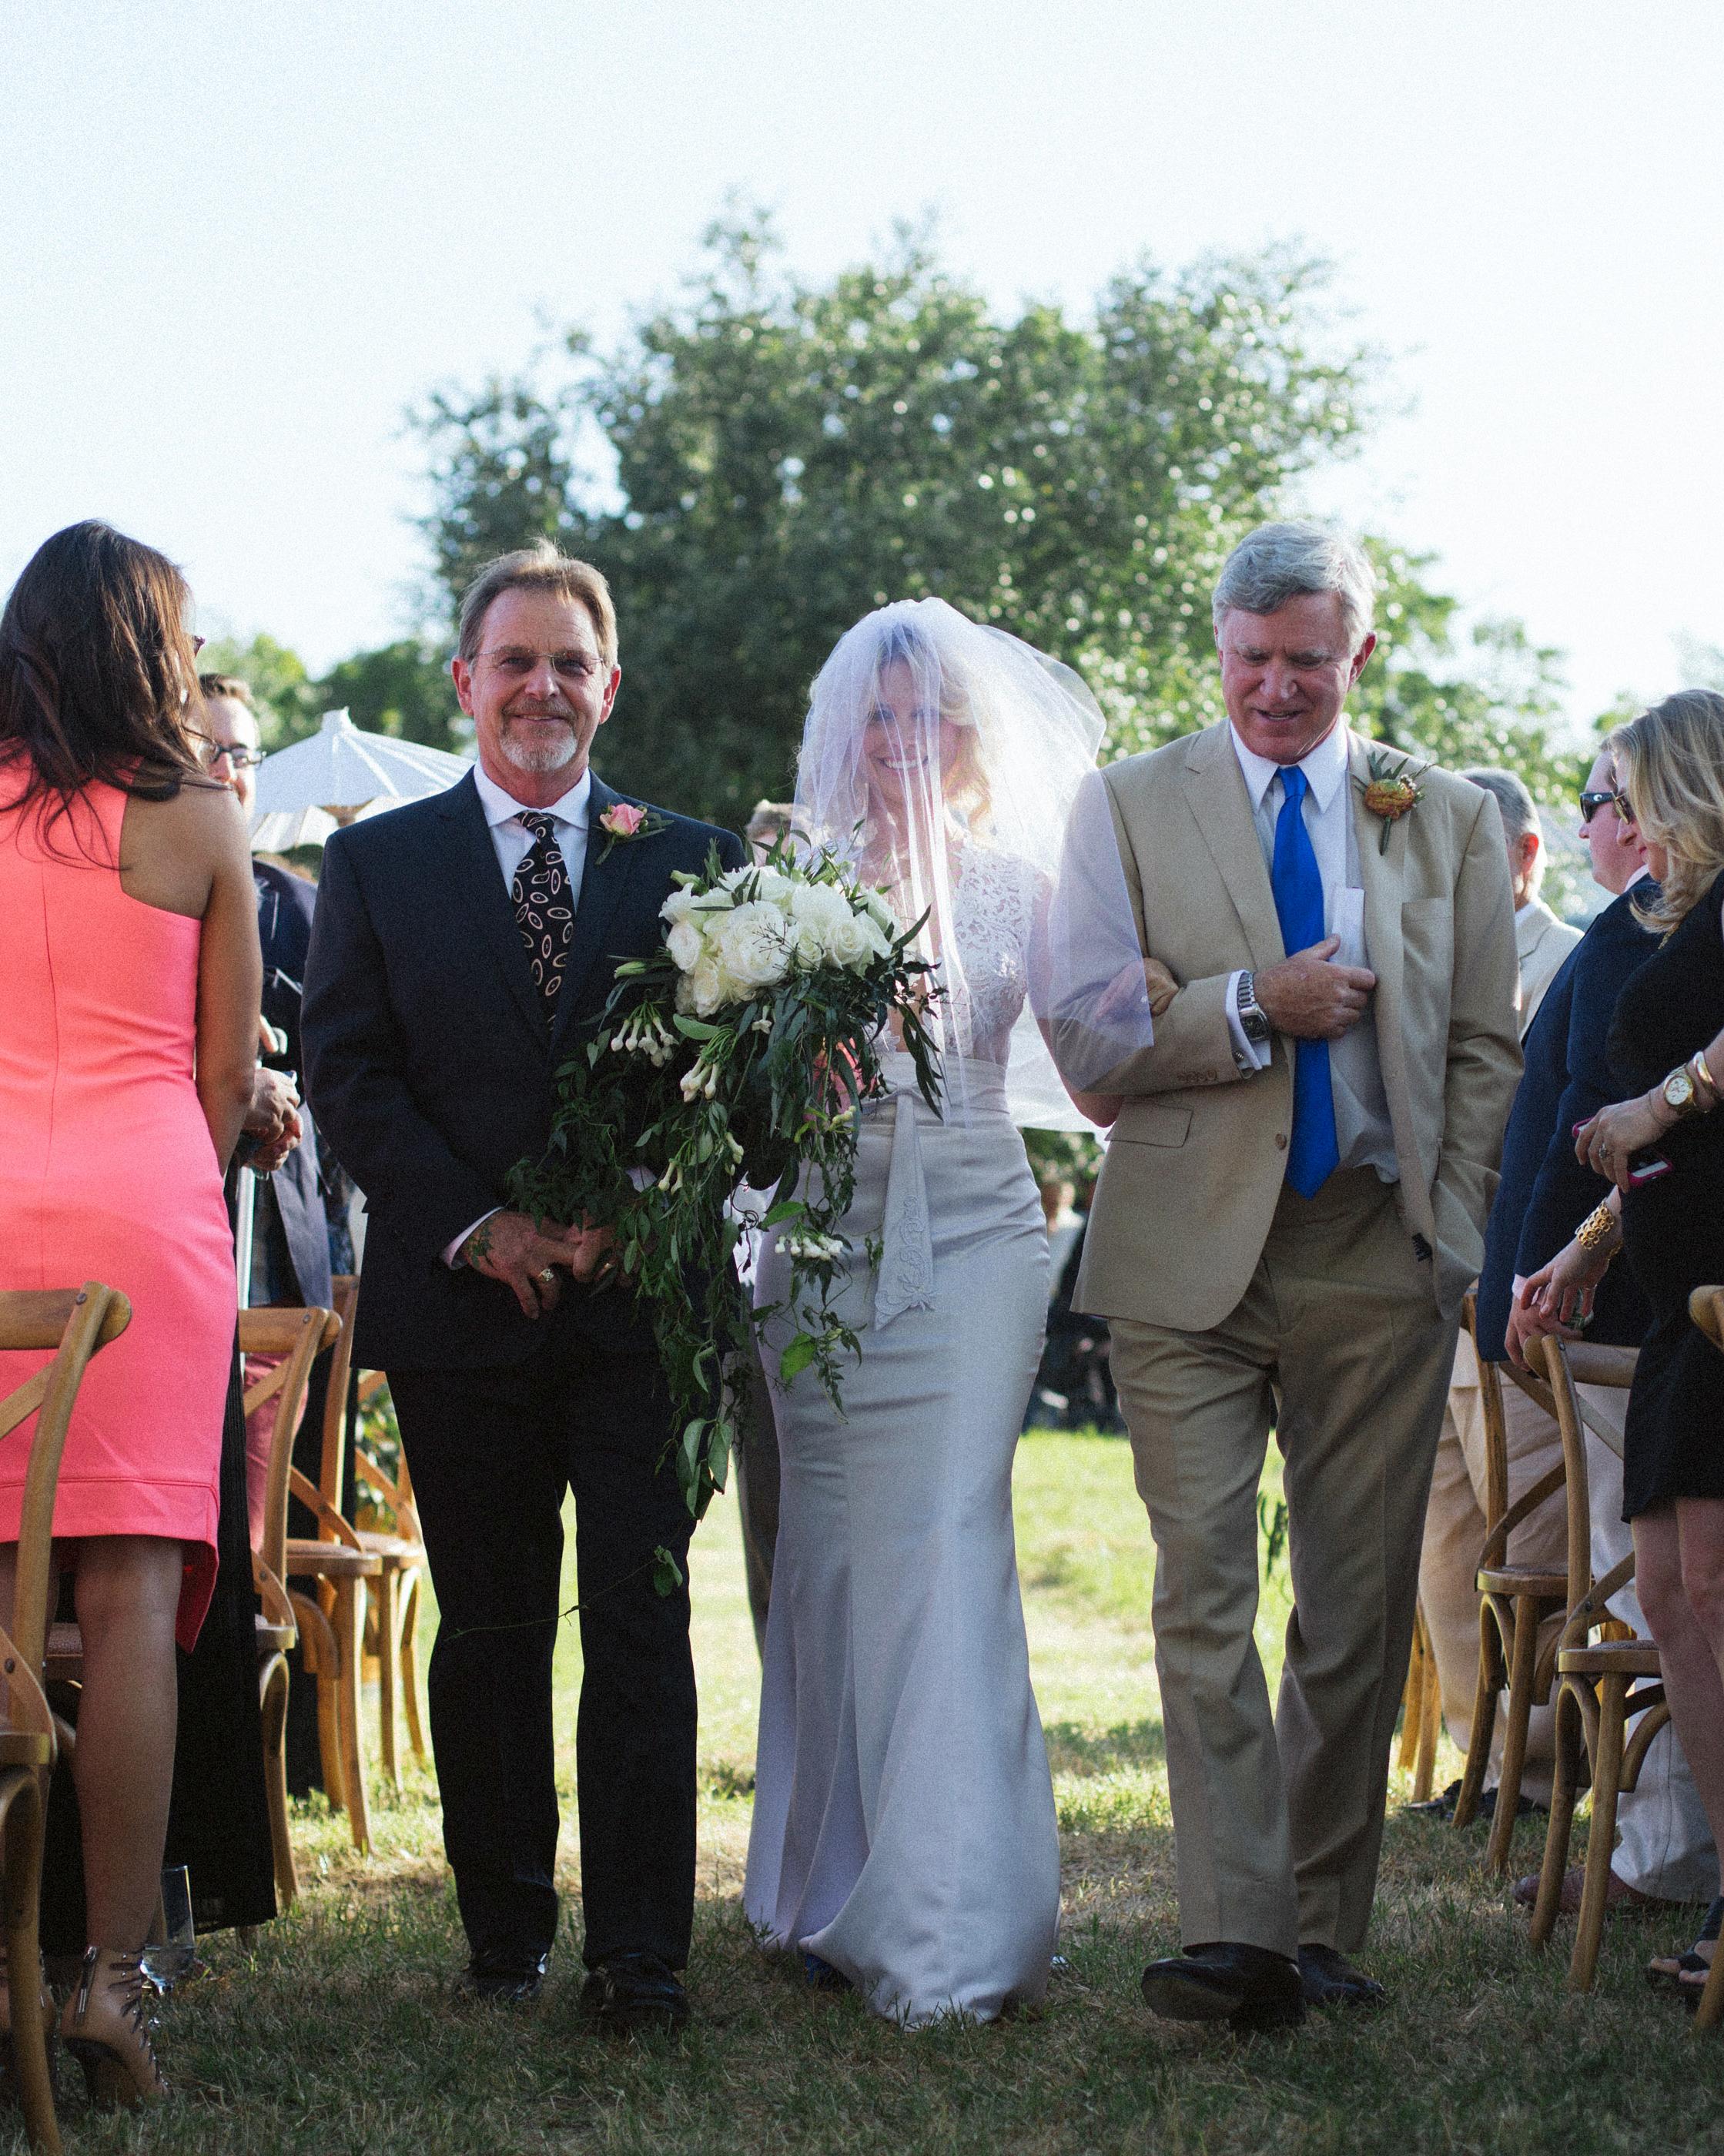 leah-michael-wedding-processional-0722-s111861-0515.jpg